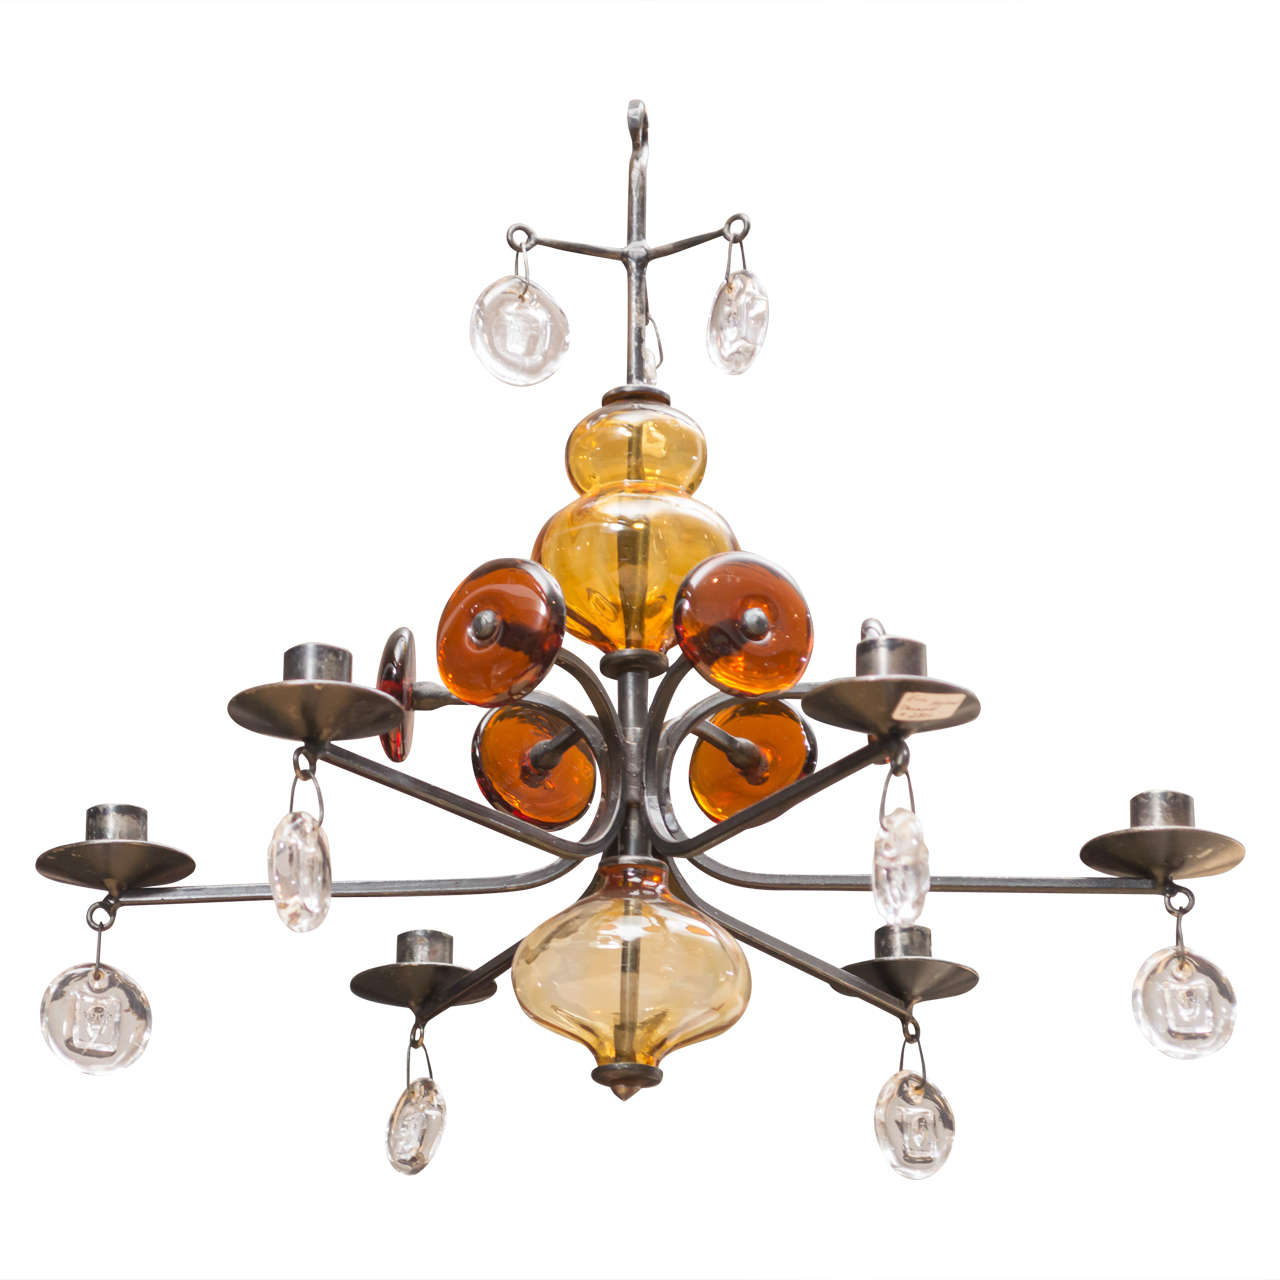 Erik hoglund six light chandelier at 1stdibs erik hoglund six light chandelier for sale arubaitofo Choice Image